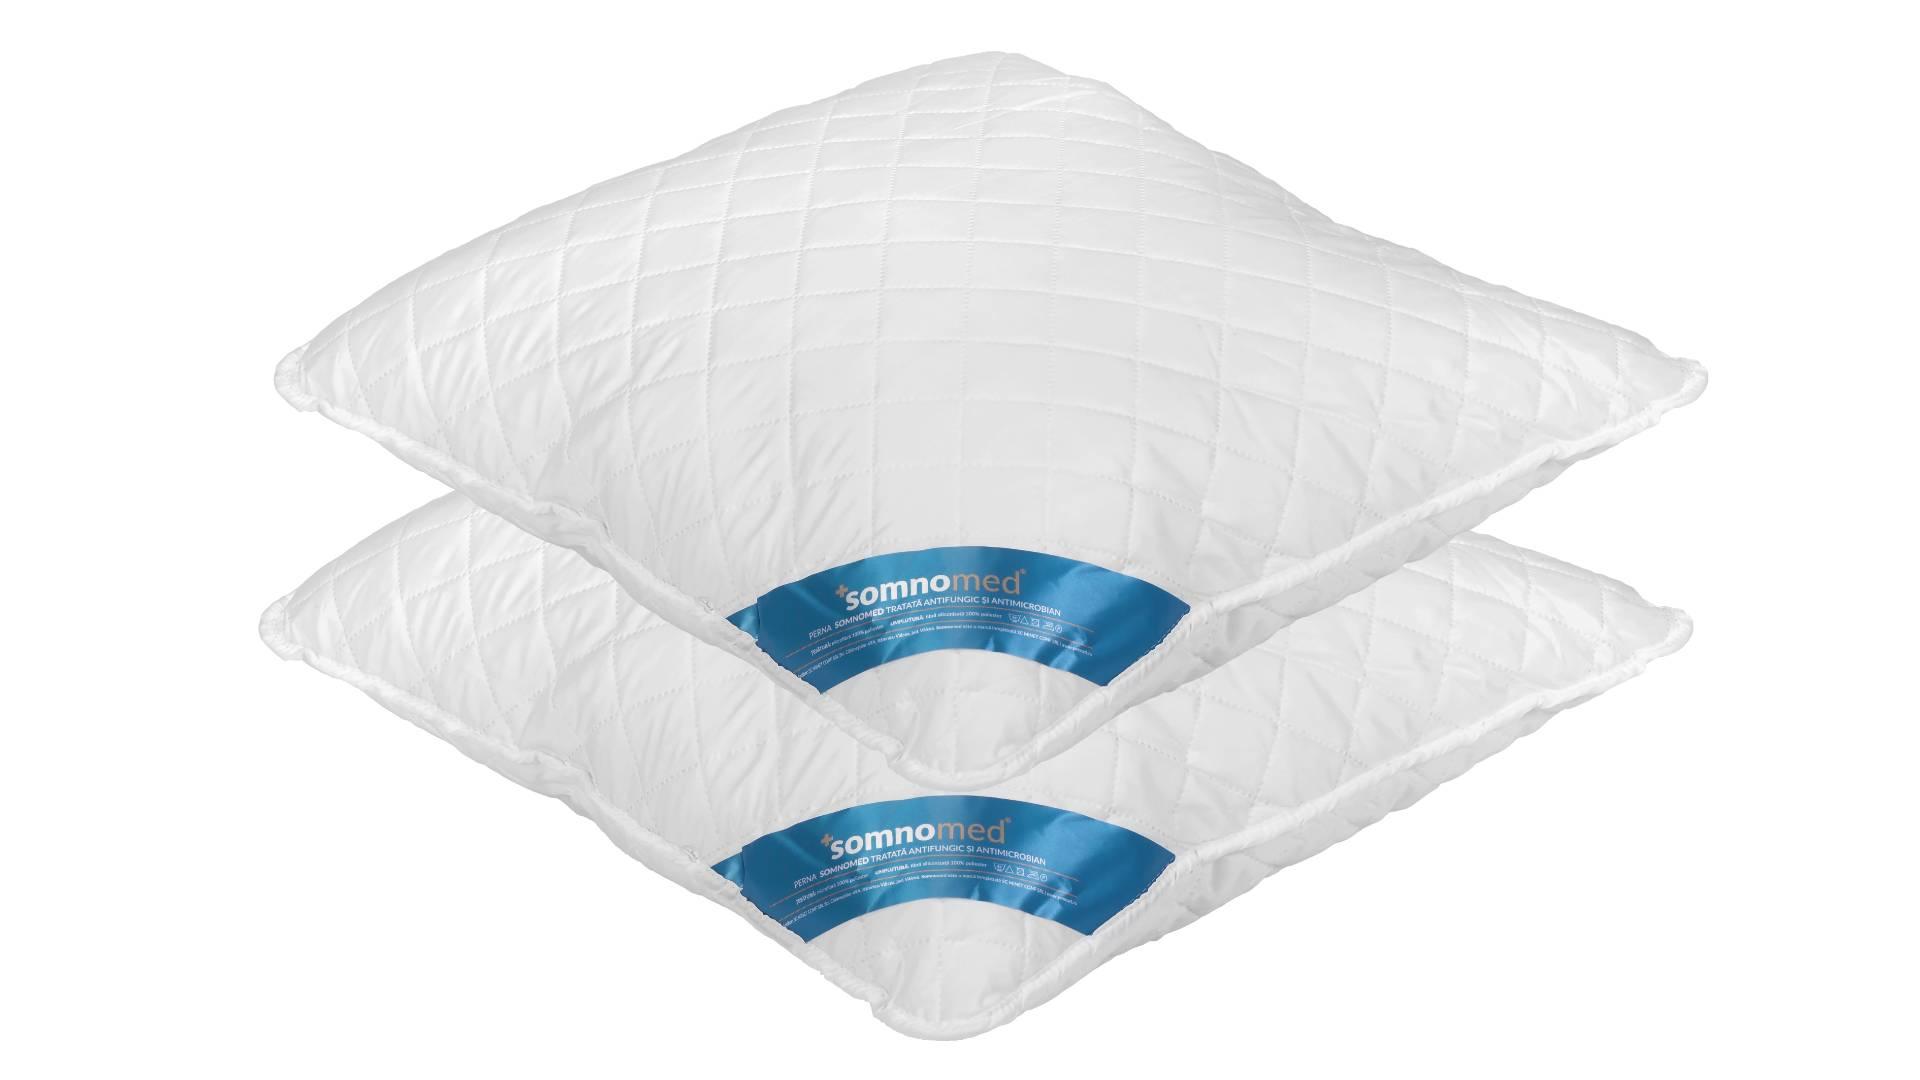 SET 2 Perne Somnomed Antimicrobiene si Antifungice lavabile la 95°C - 70 x 70 cm imagine 2021 somnart.ro